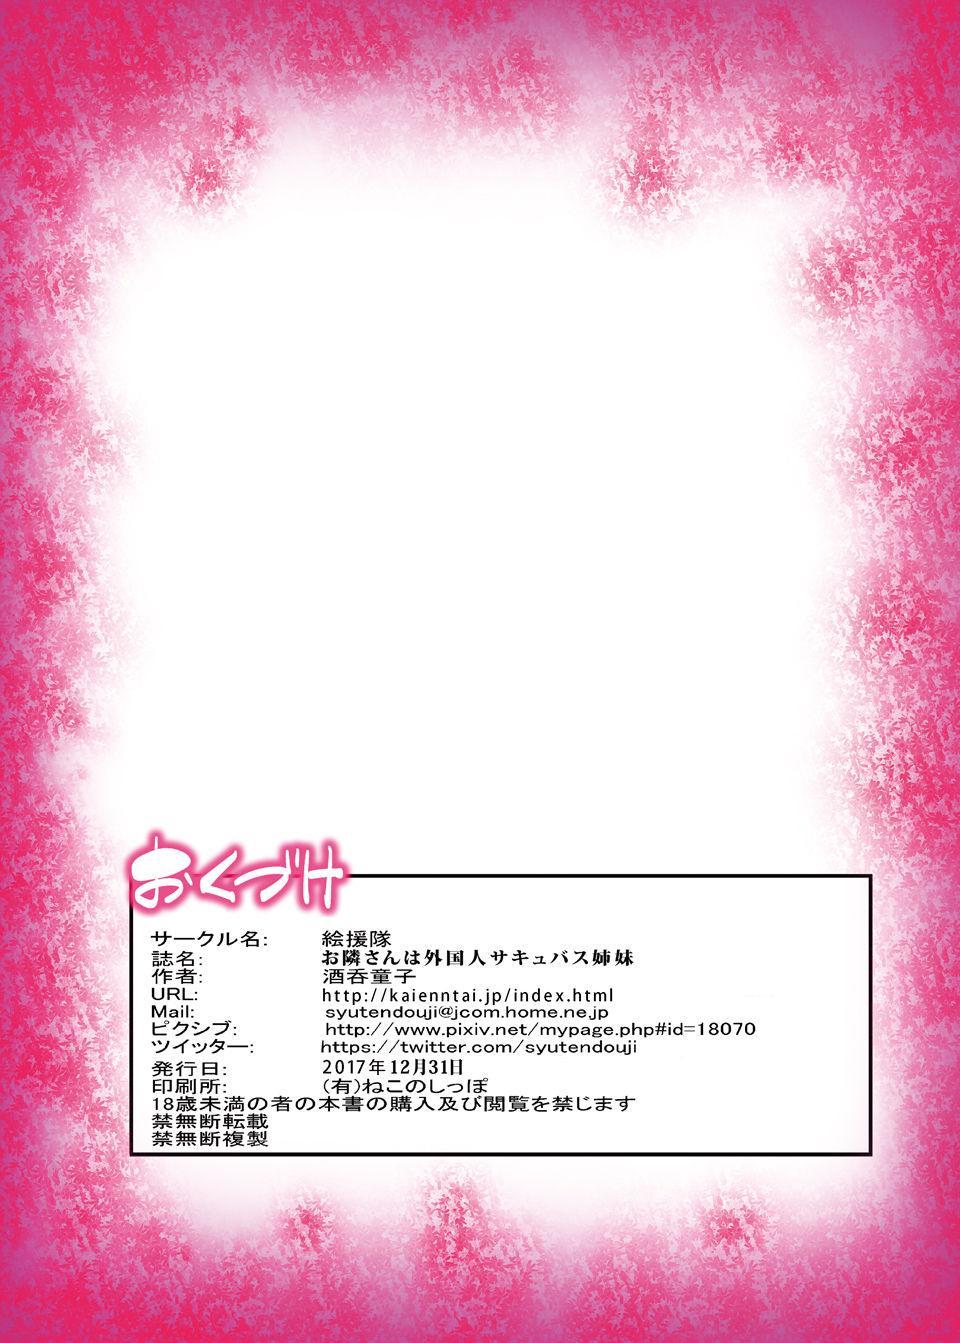 Otonari-san wa Gaikokujin Succubus Shimai 41